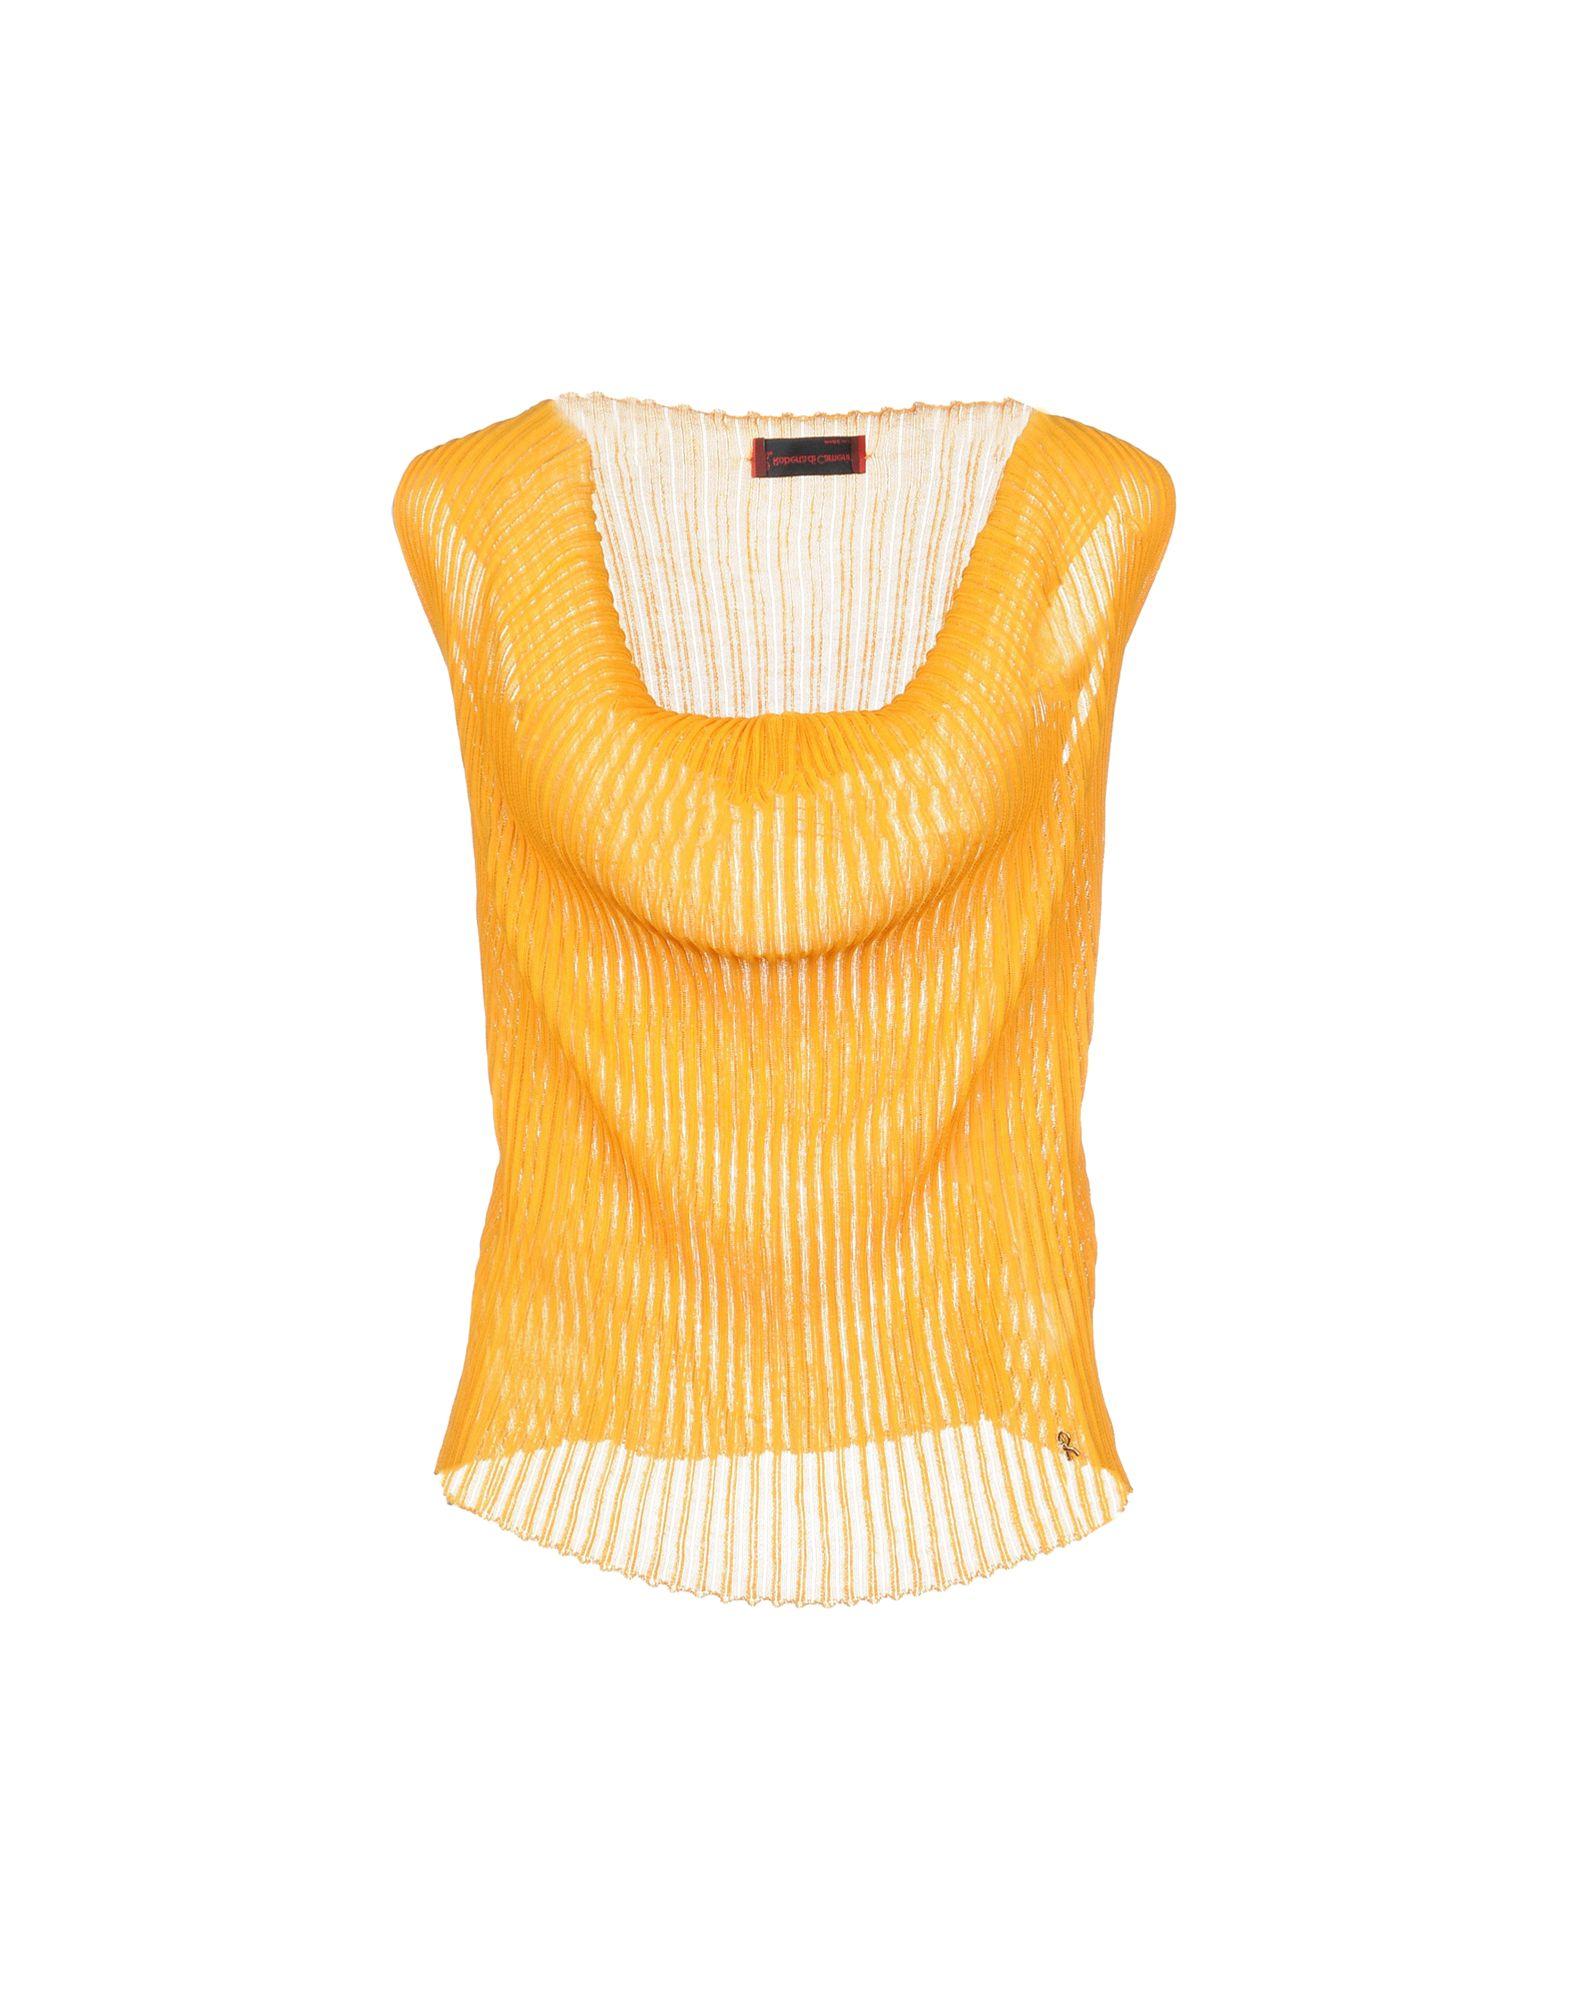 ROBERTA DI CAMERINO Sweater in Ocher